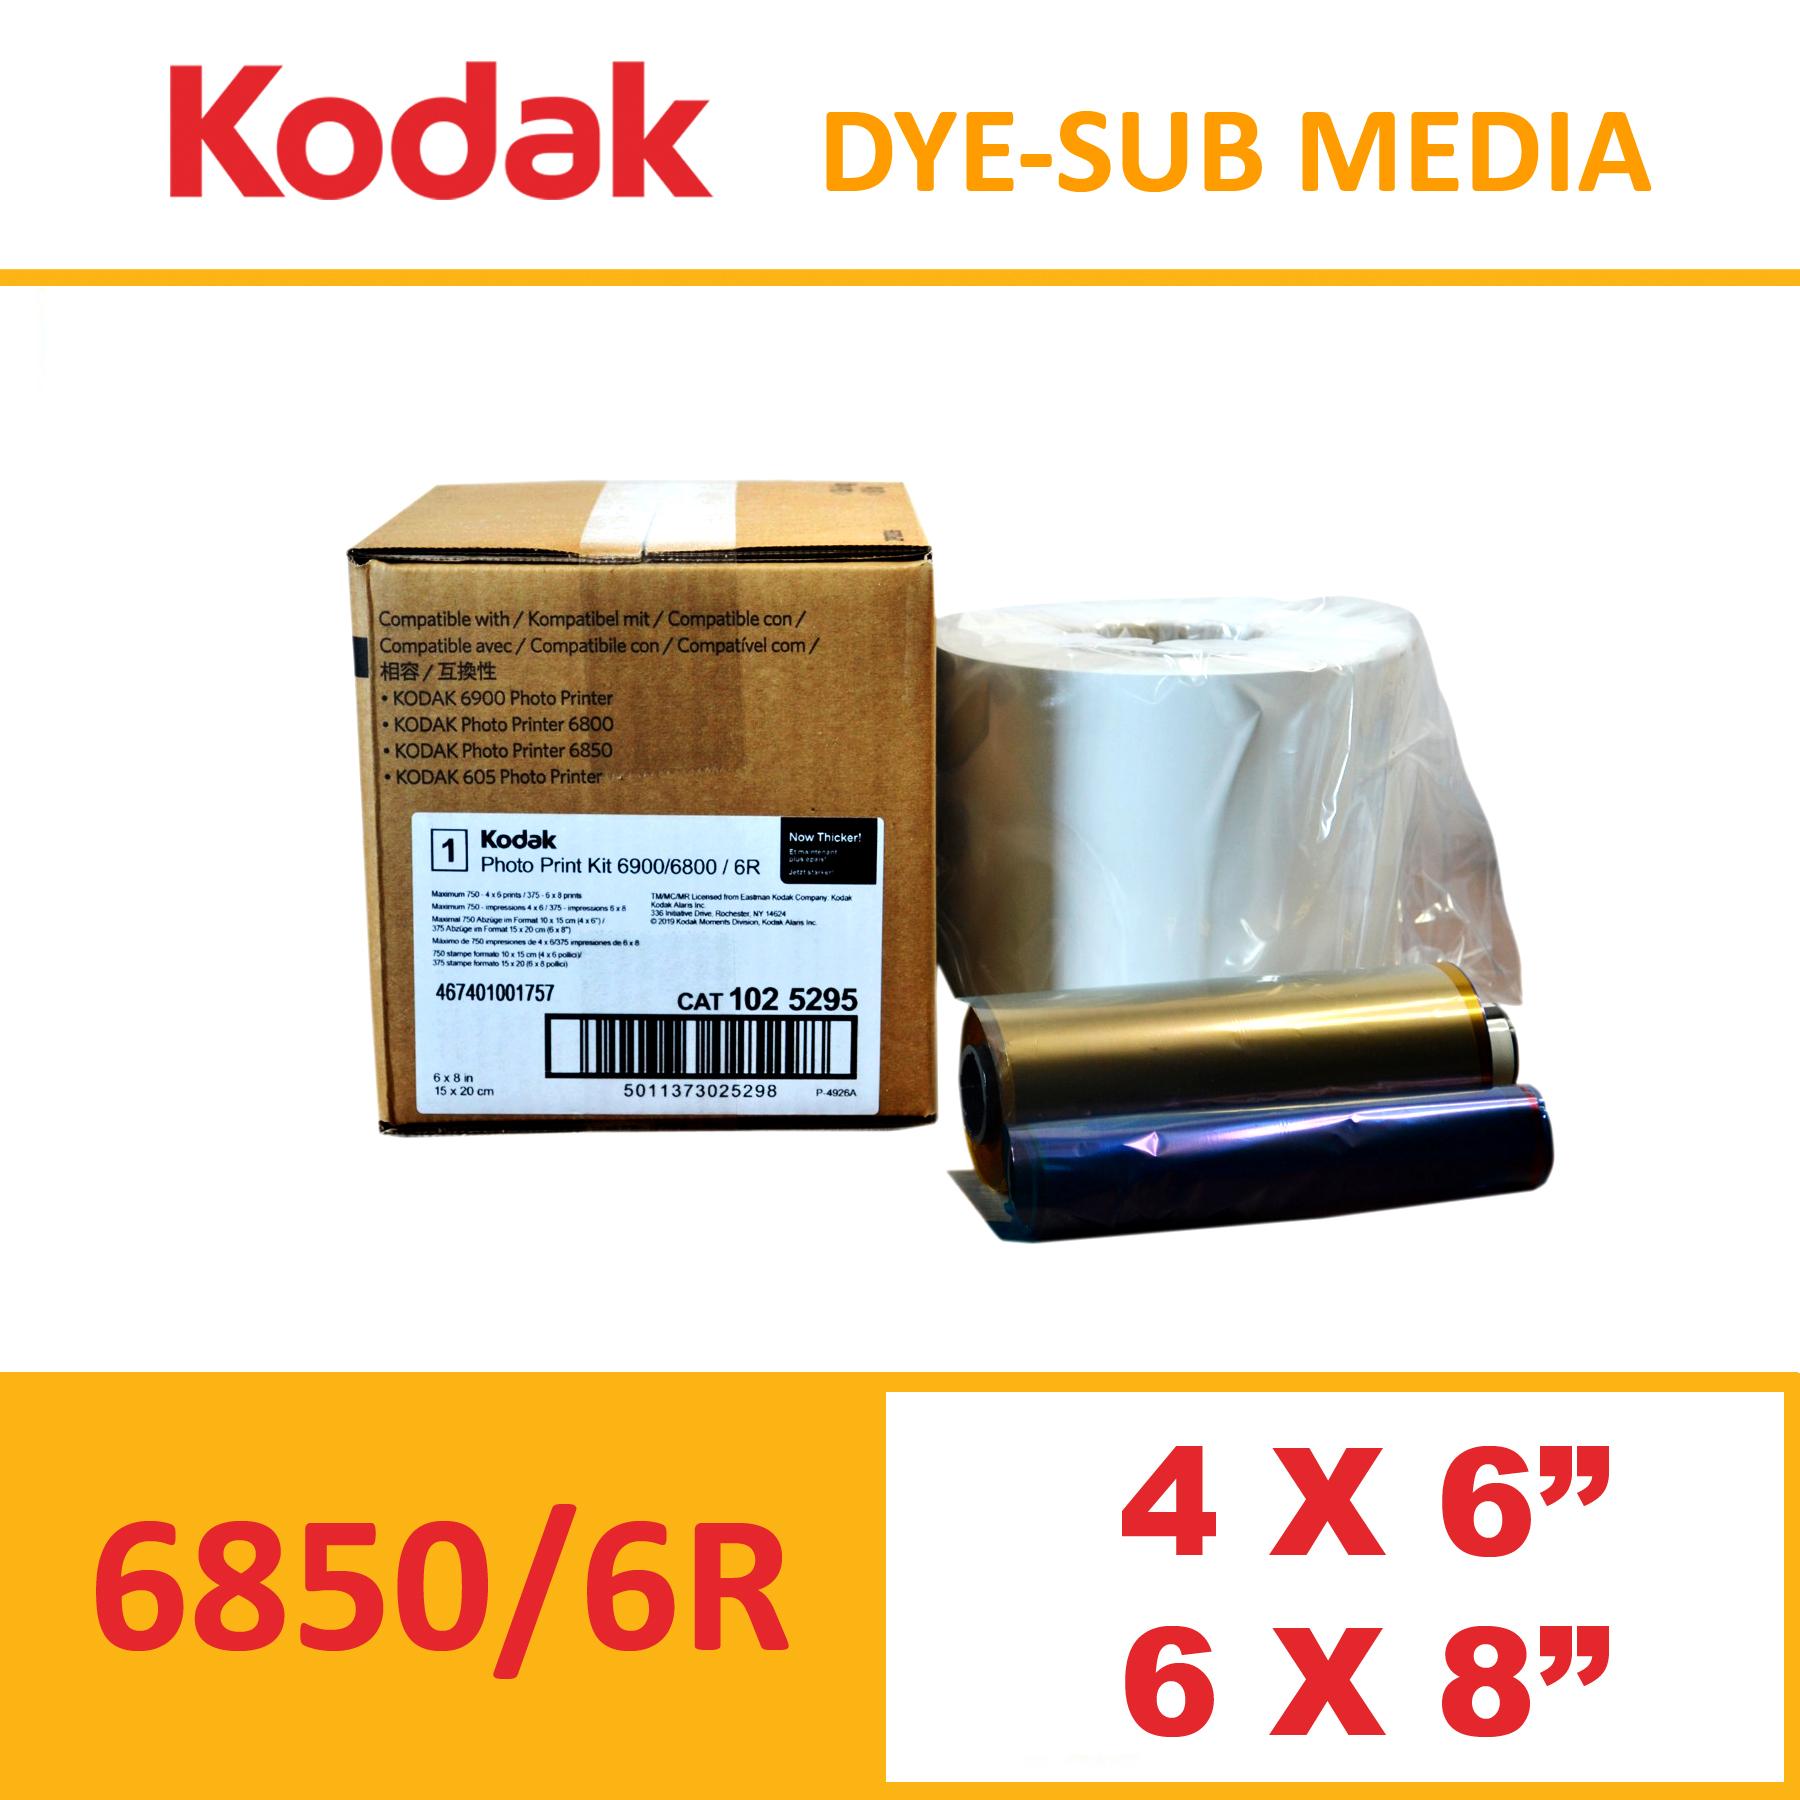 Kodak 6850/6900 Dye-Sub Photo Printer Media Kit